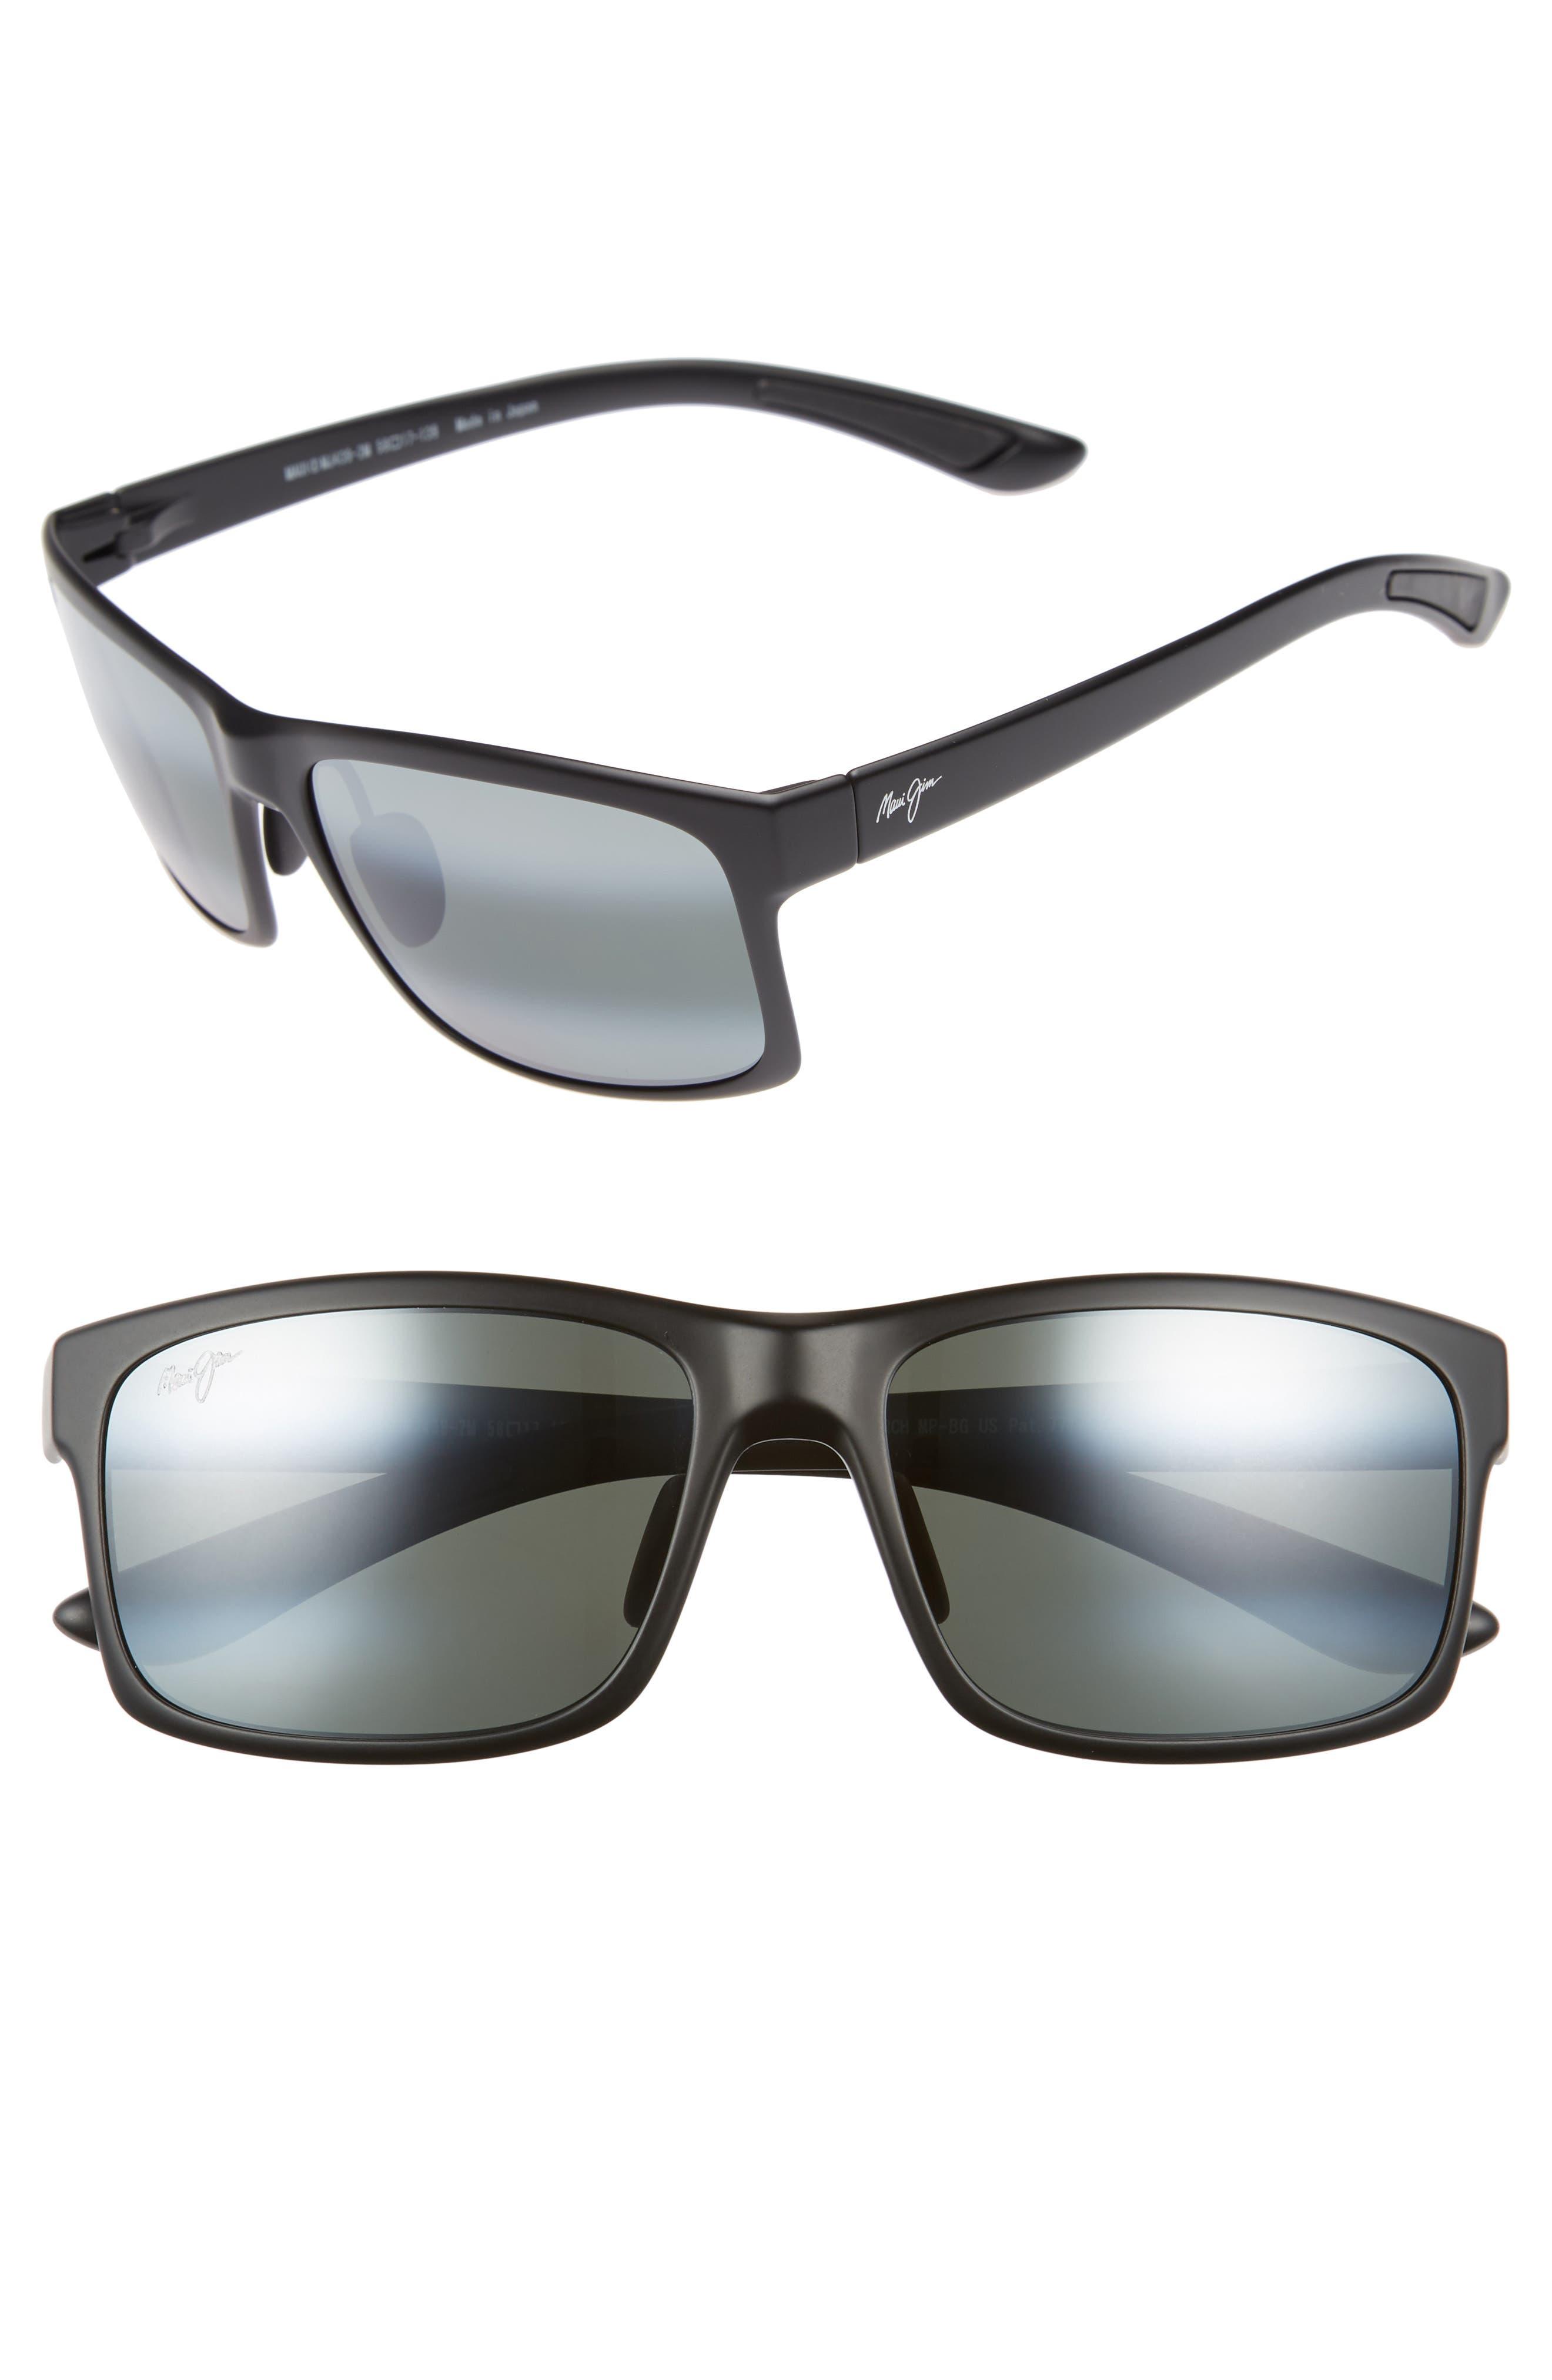 Pokowai Arch 58mm Polarized Sunglasses,                             Main thumbnail 1, color,                             BLACK MATTE/ NEUTRAL GREY